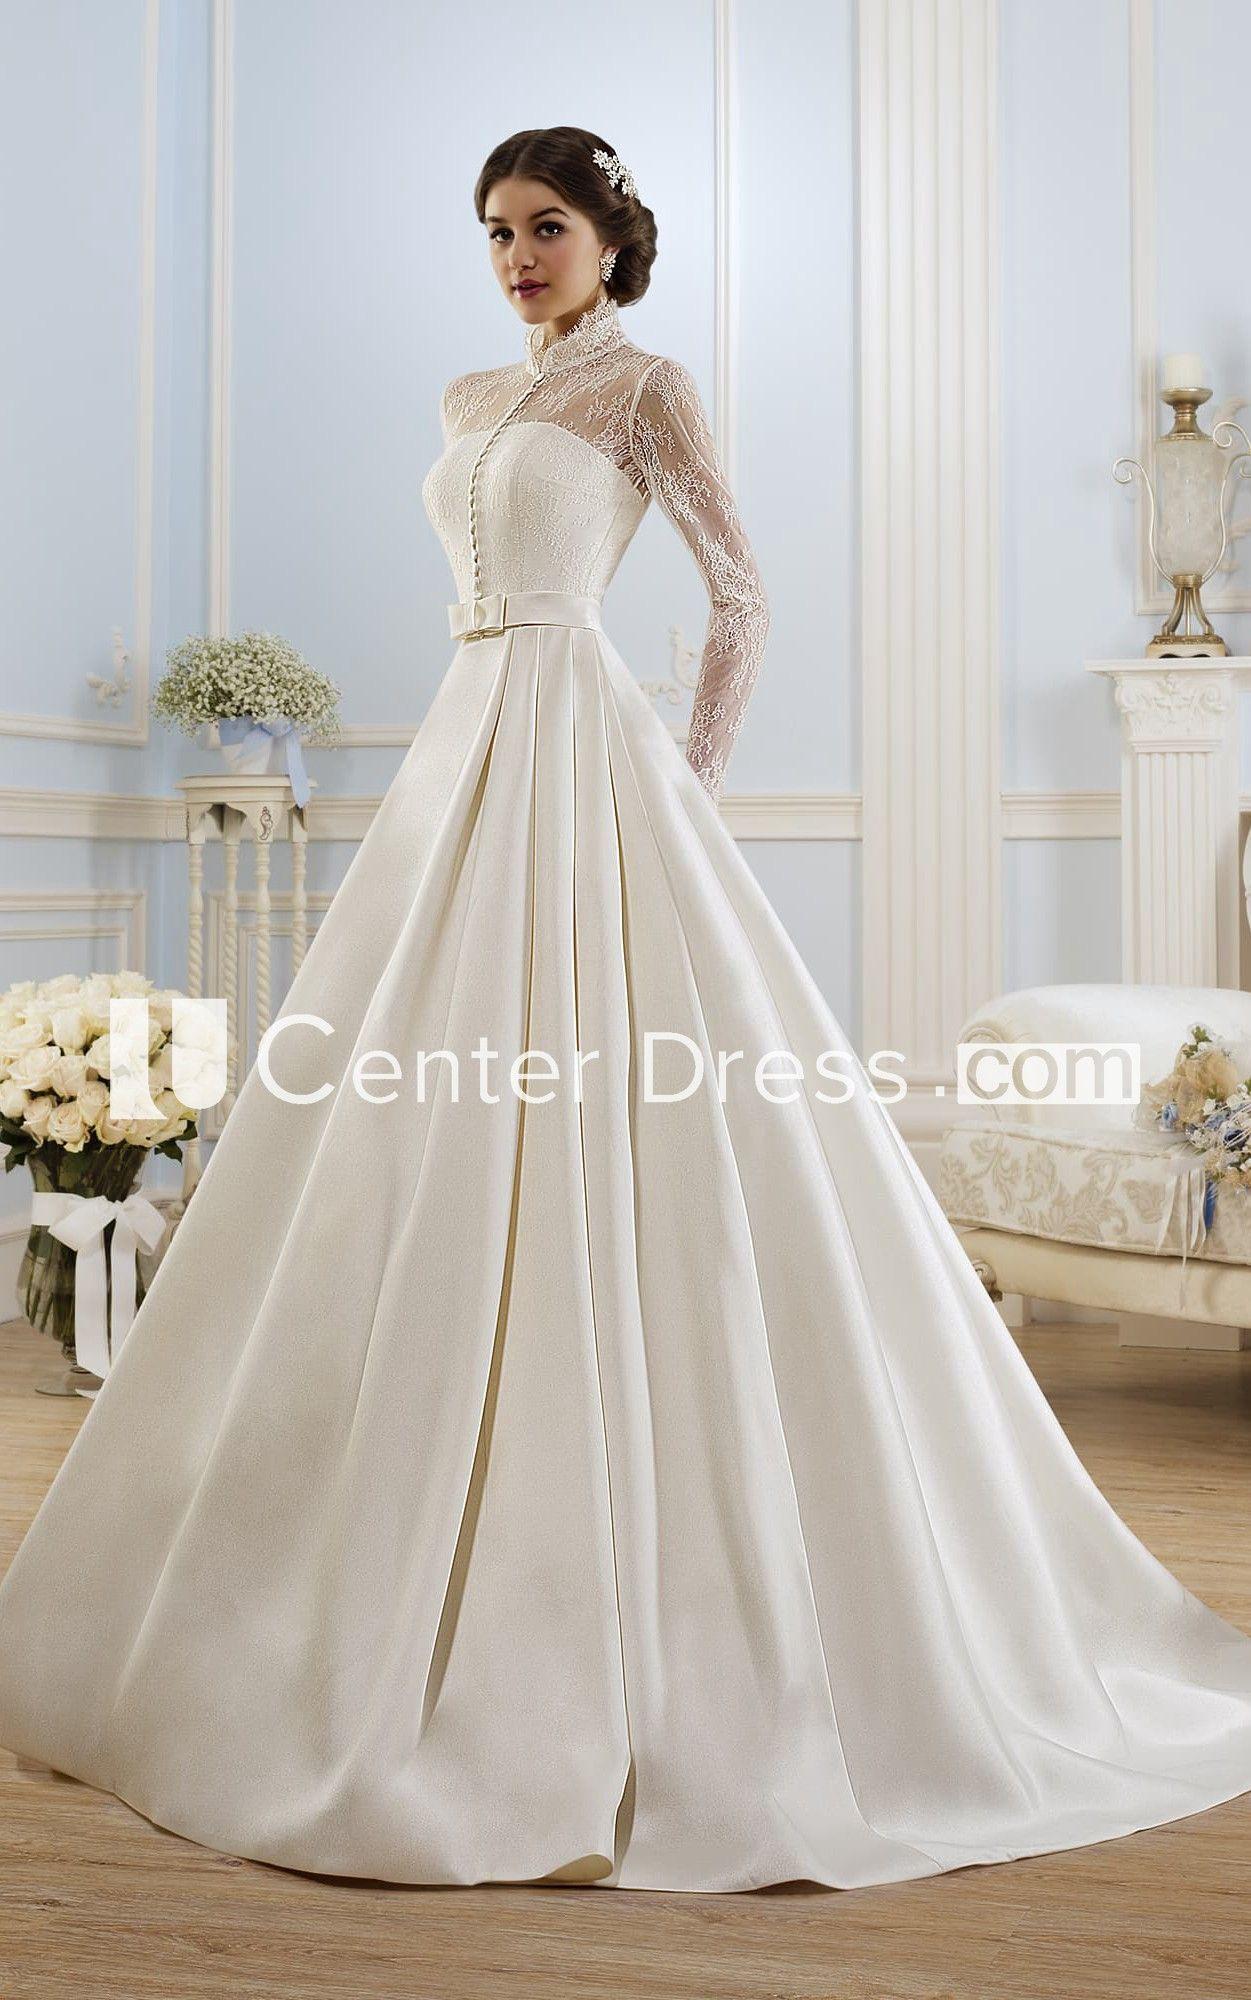 Pin By Kelly Putman On Wedding Dress Sleeves Modest Wedding Dresses Ball Gowns Wedding Dream Wedding Dresses [ 2000 x 1251 Pixel ]